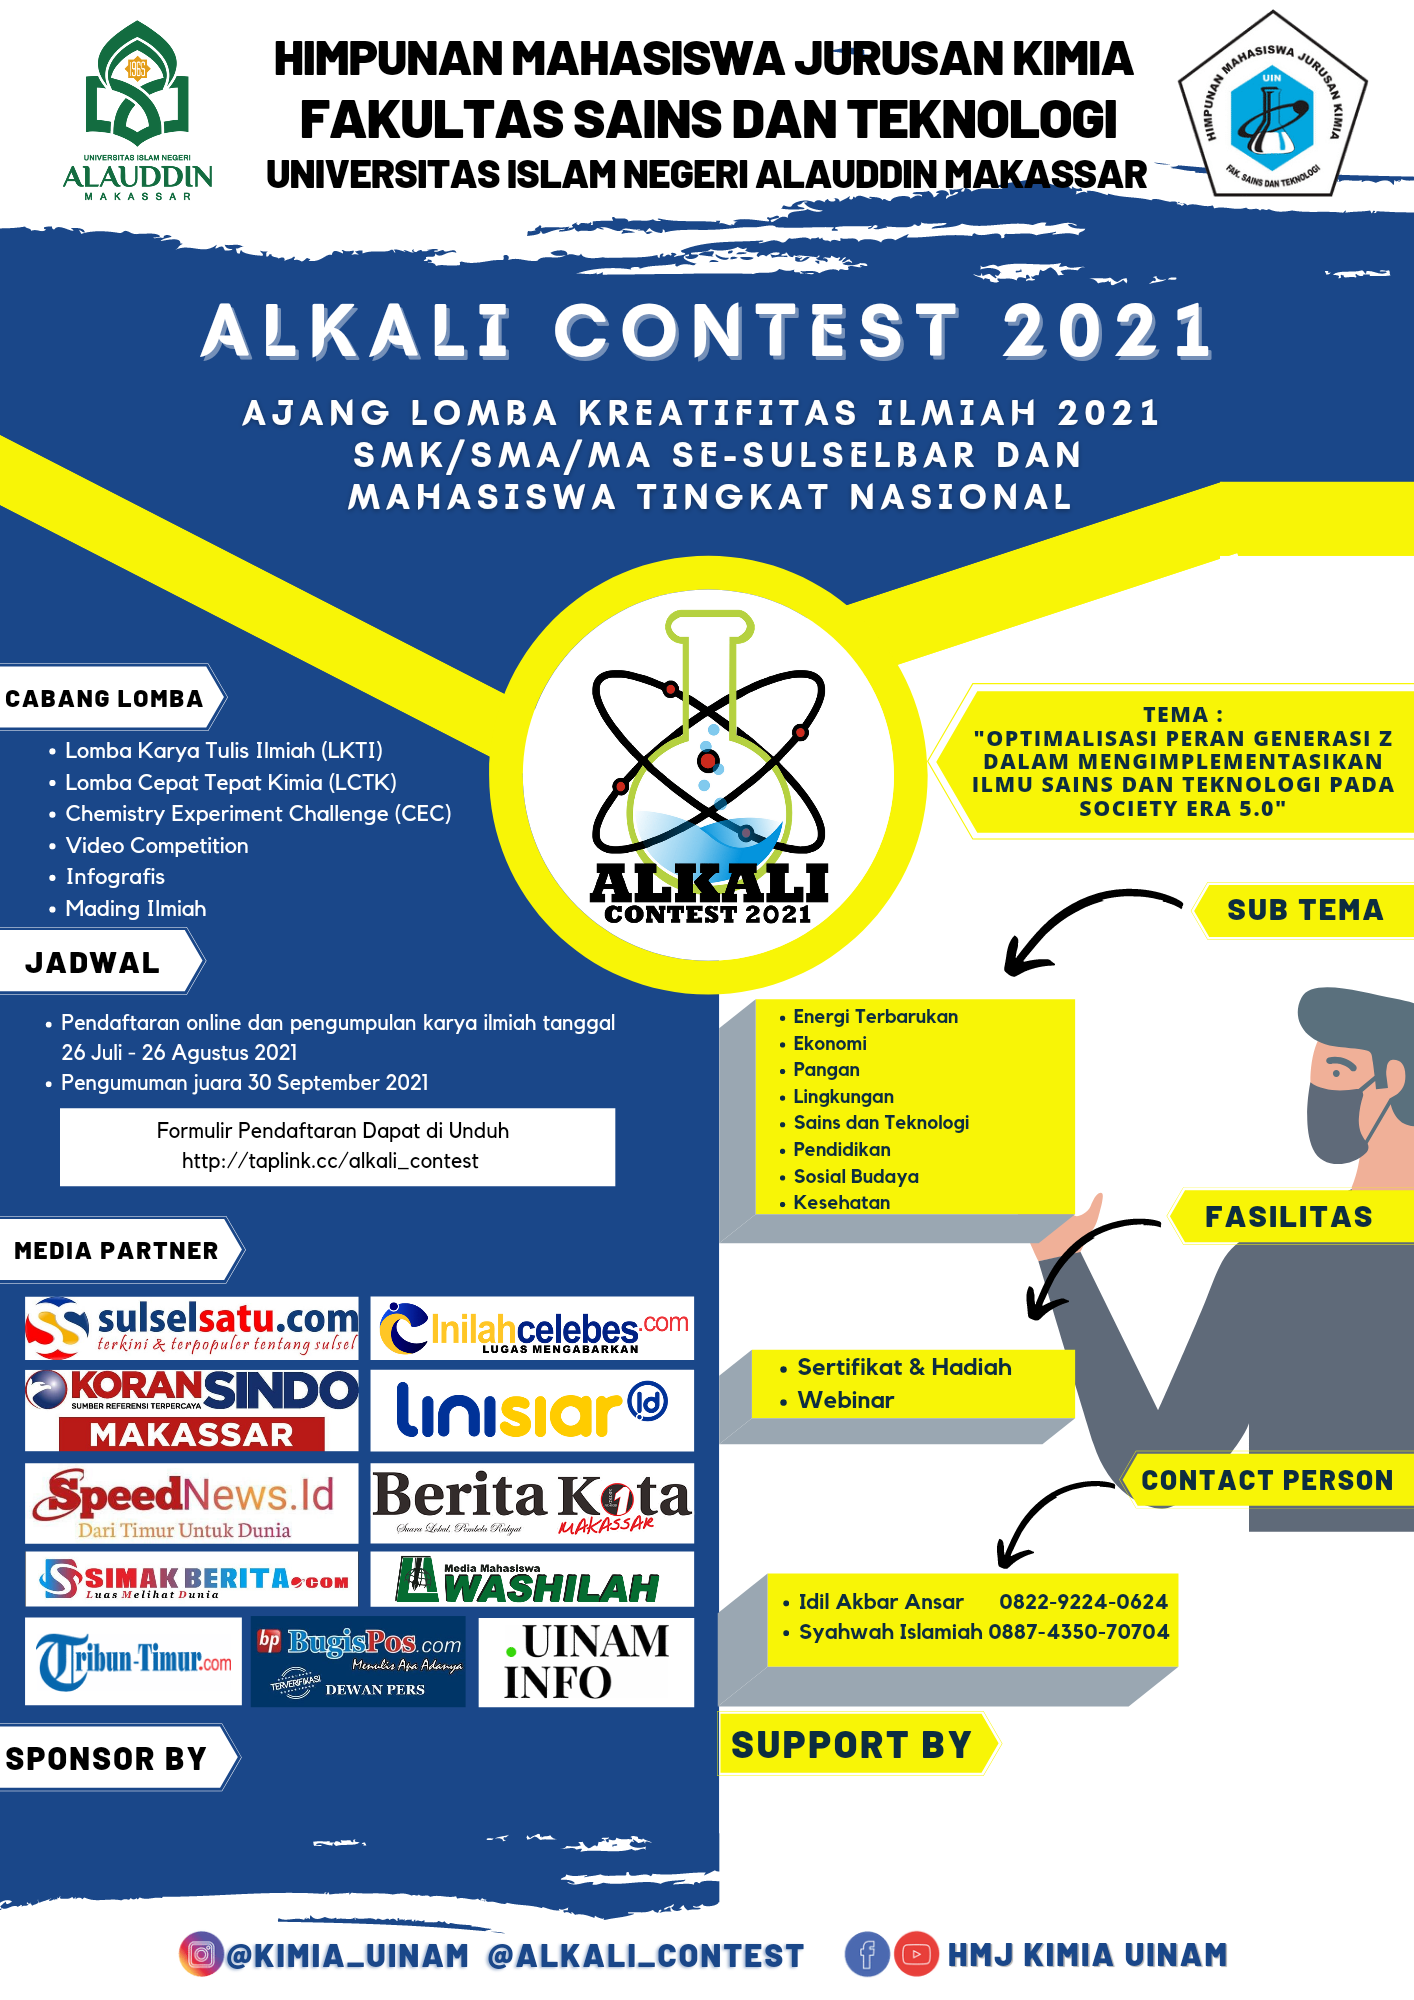 H-1 Jelang Alkali Contest 2021